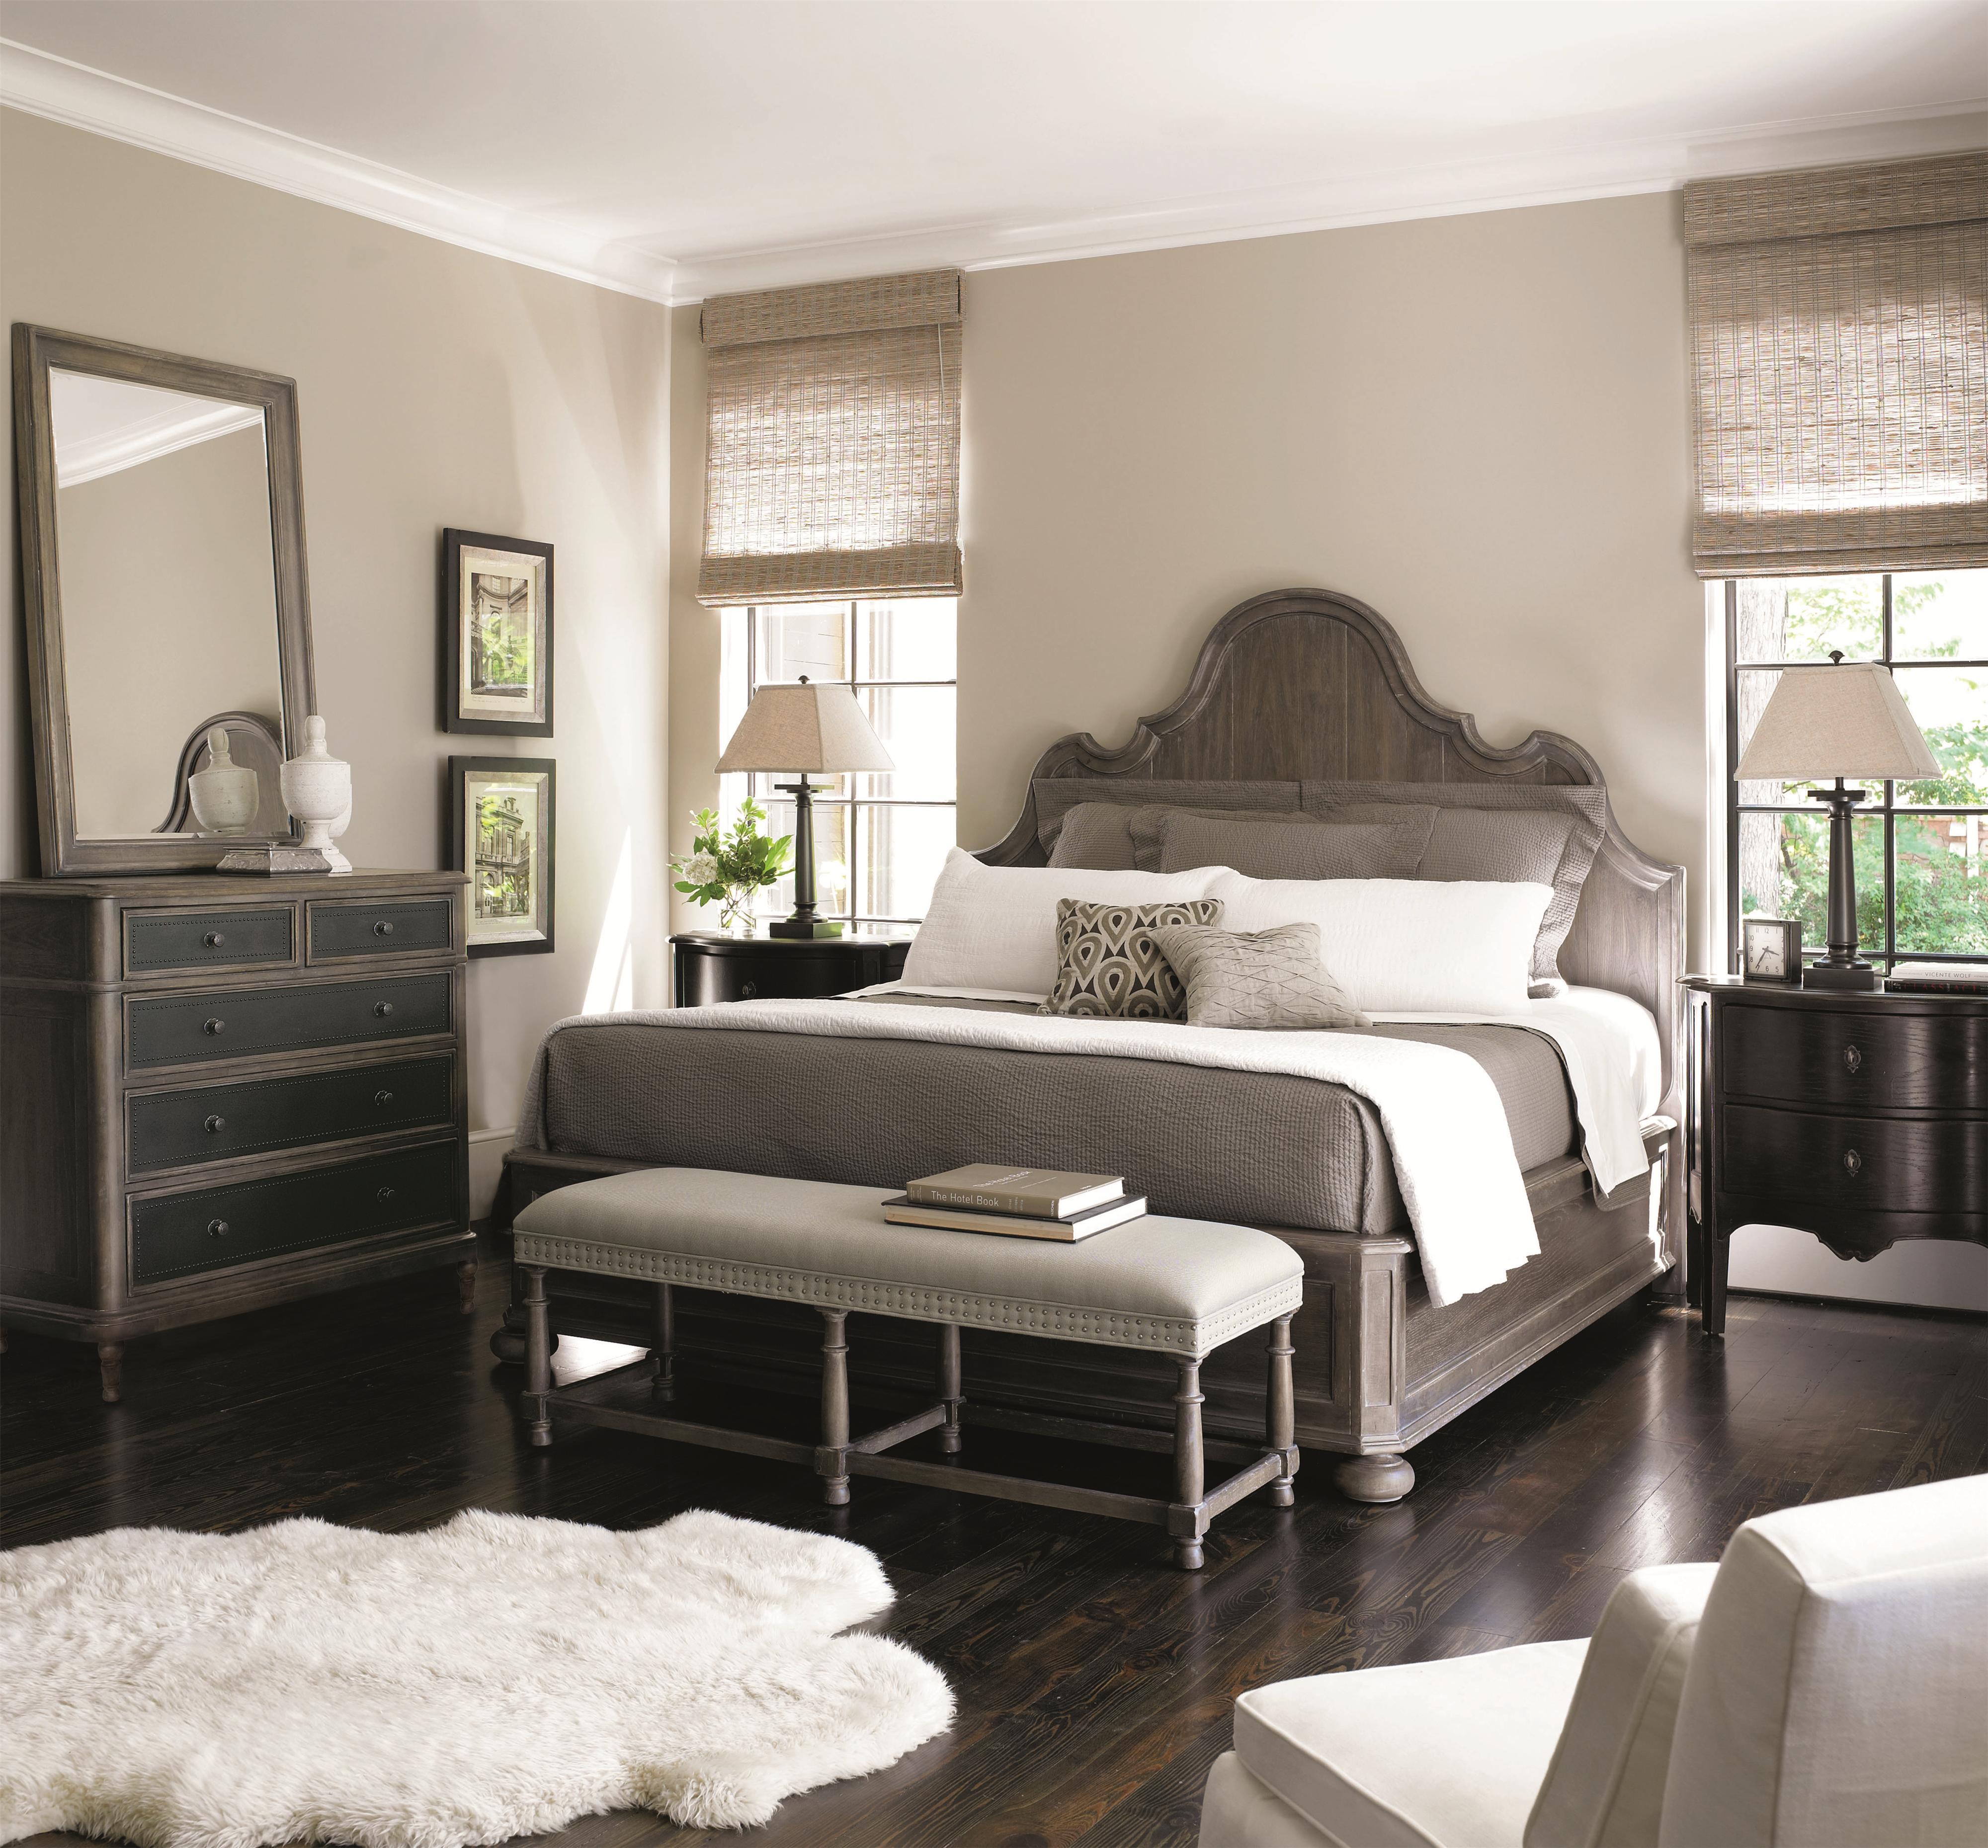 Bernhardt Belgian Oak Upholstered King Size Sleigh Bed with ...